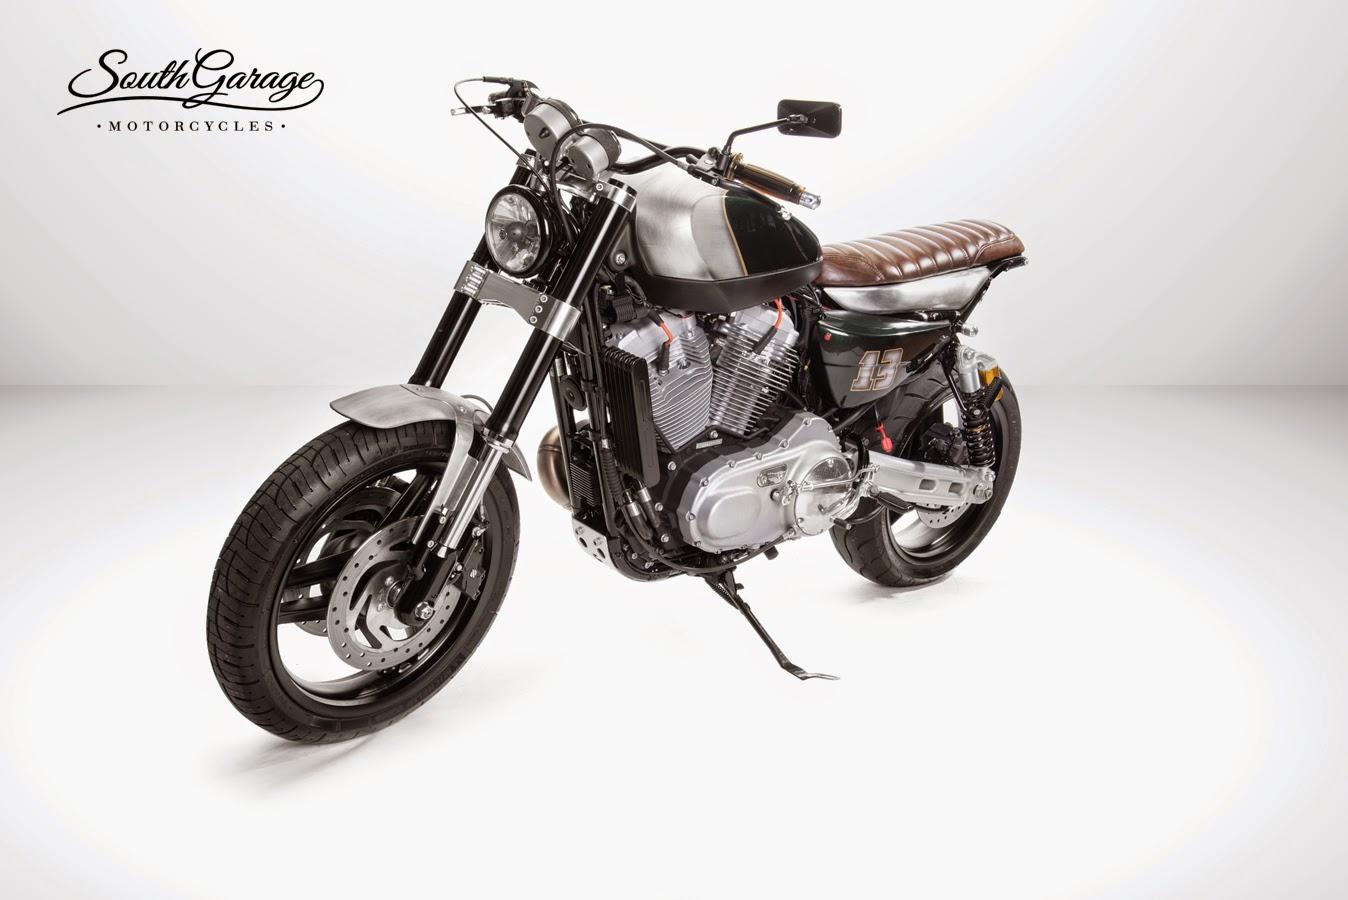 racing caf harley xr 1200 knuckle by south garage motorcycles. Black Bedroom Furniture Sets. Home Design Ideas